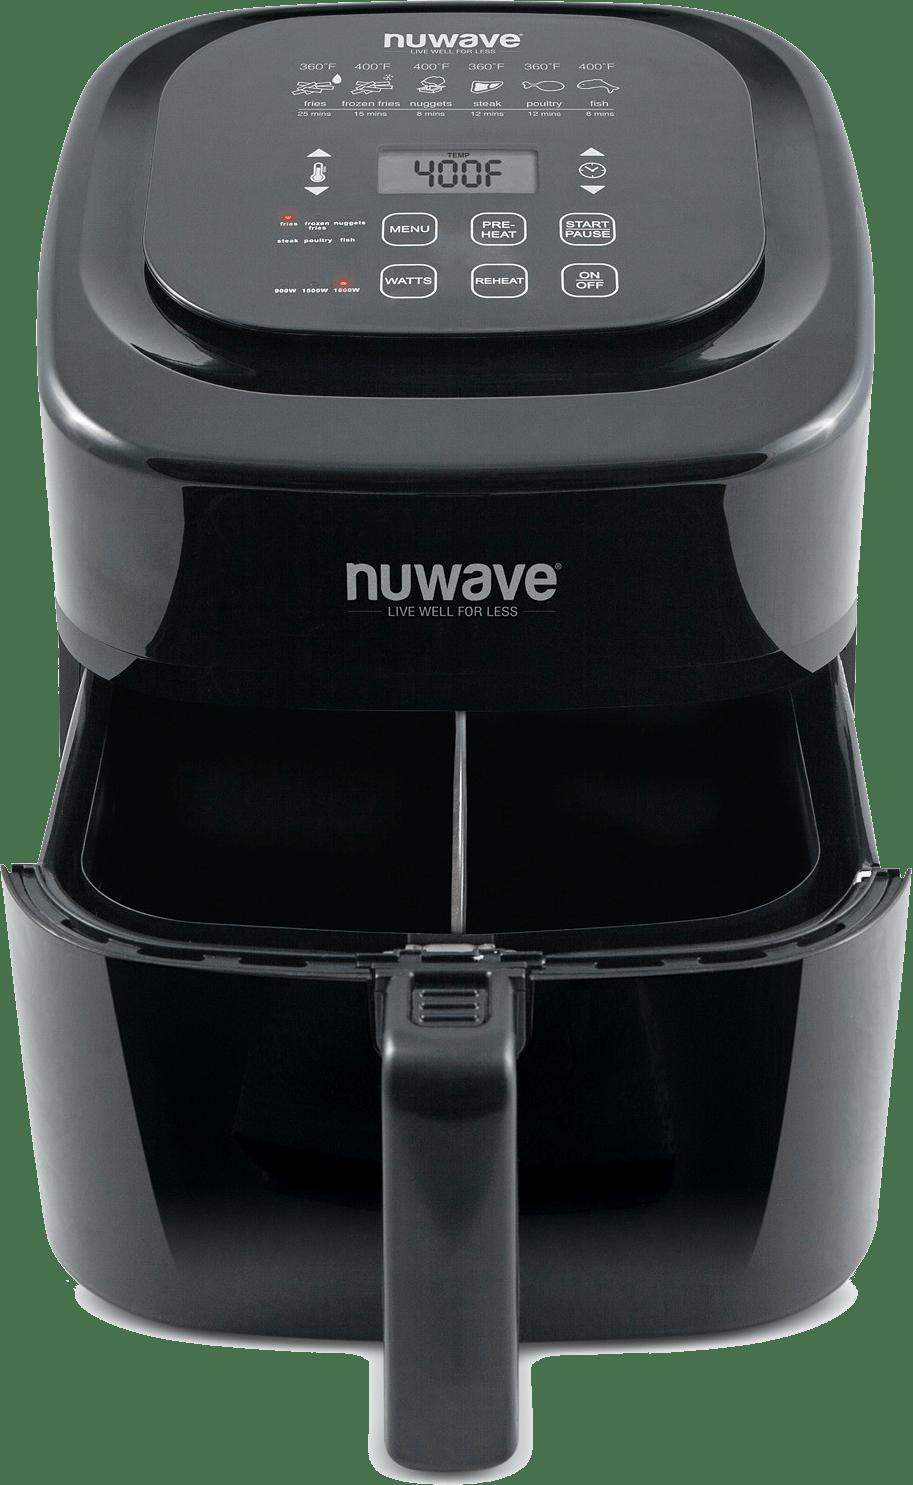 NuWave Air Fryer 2